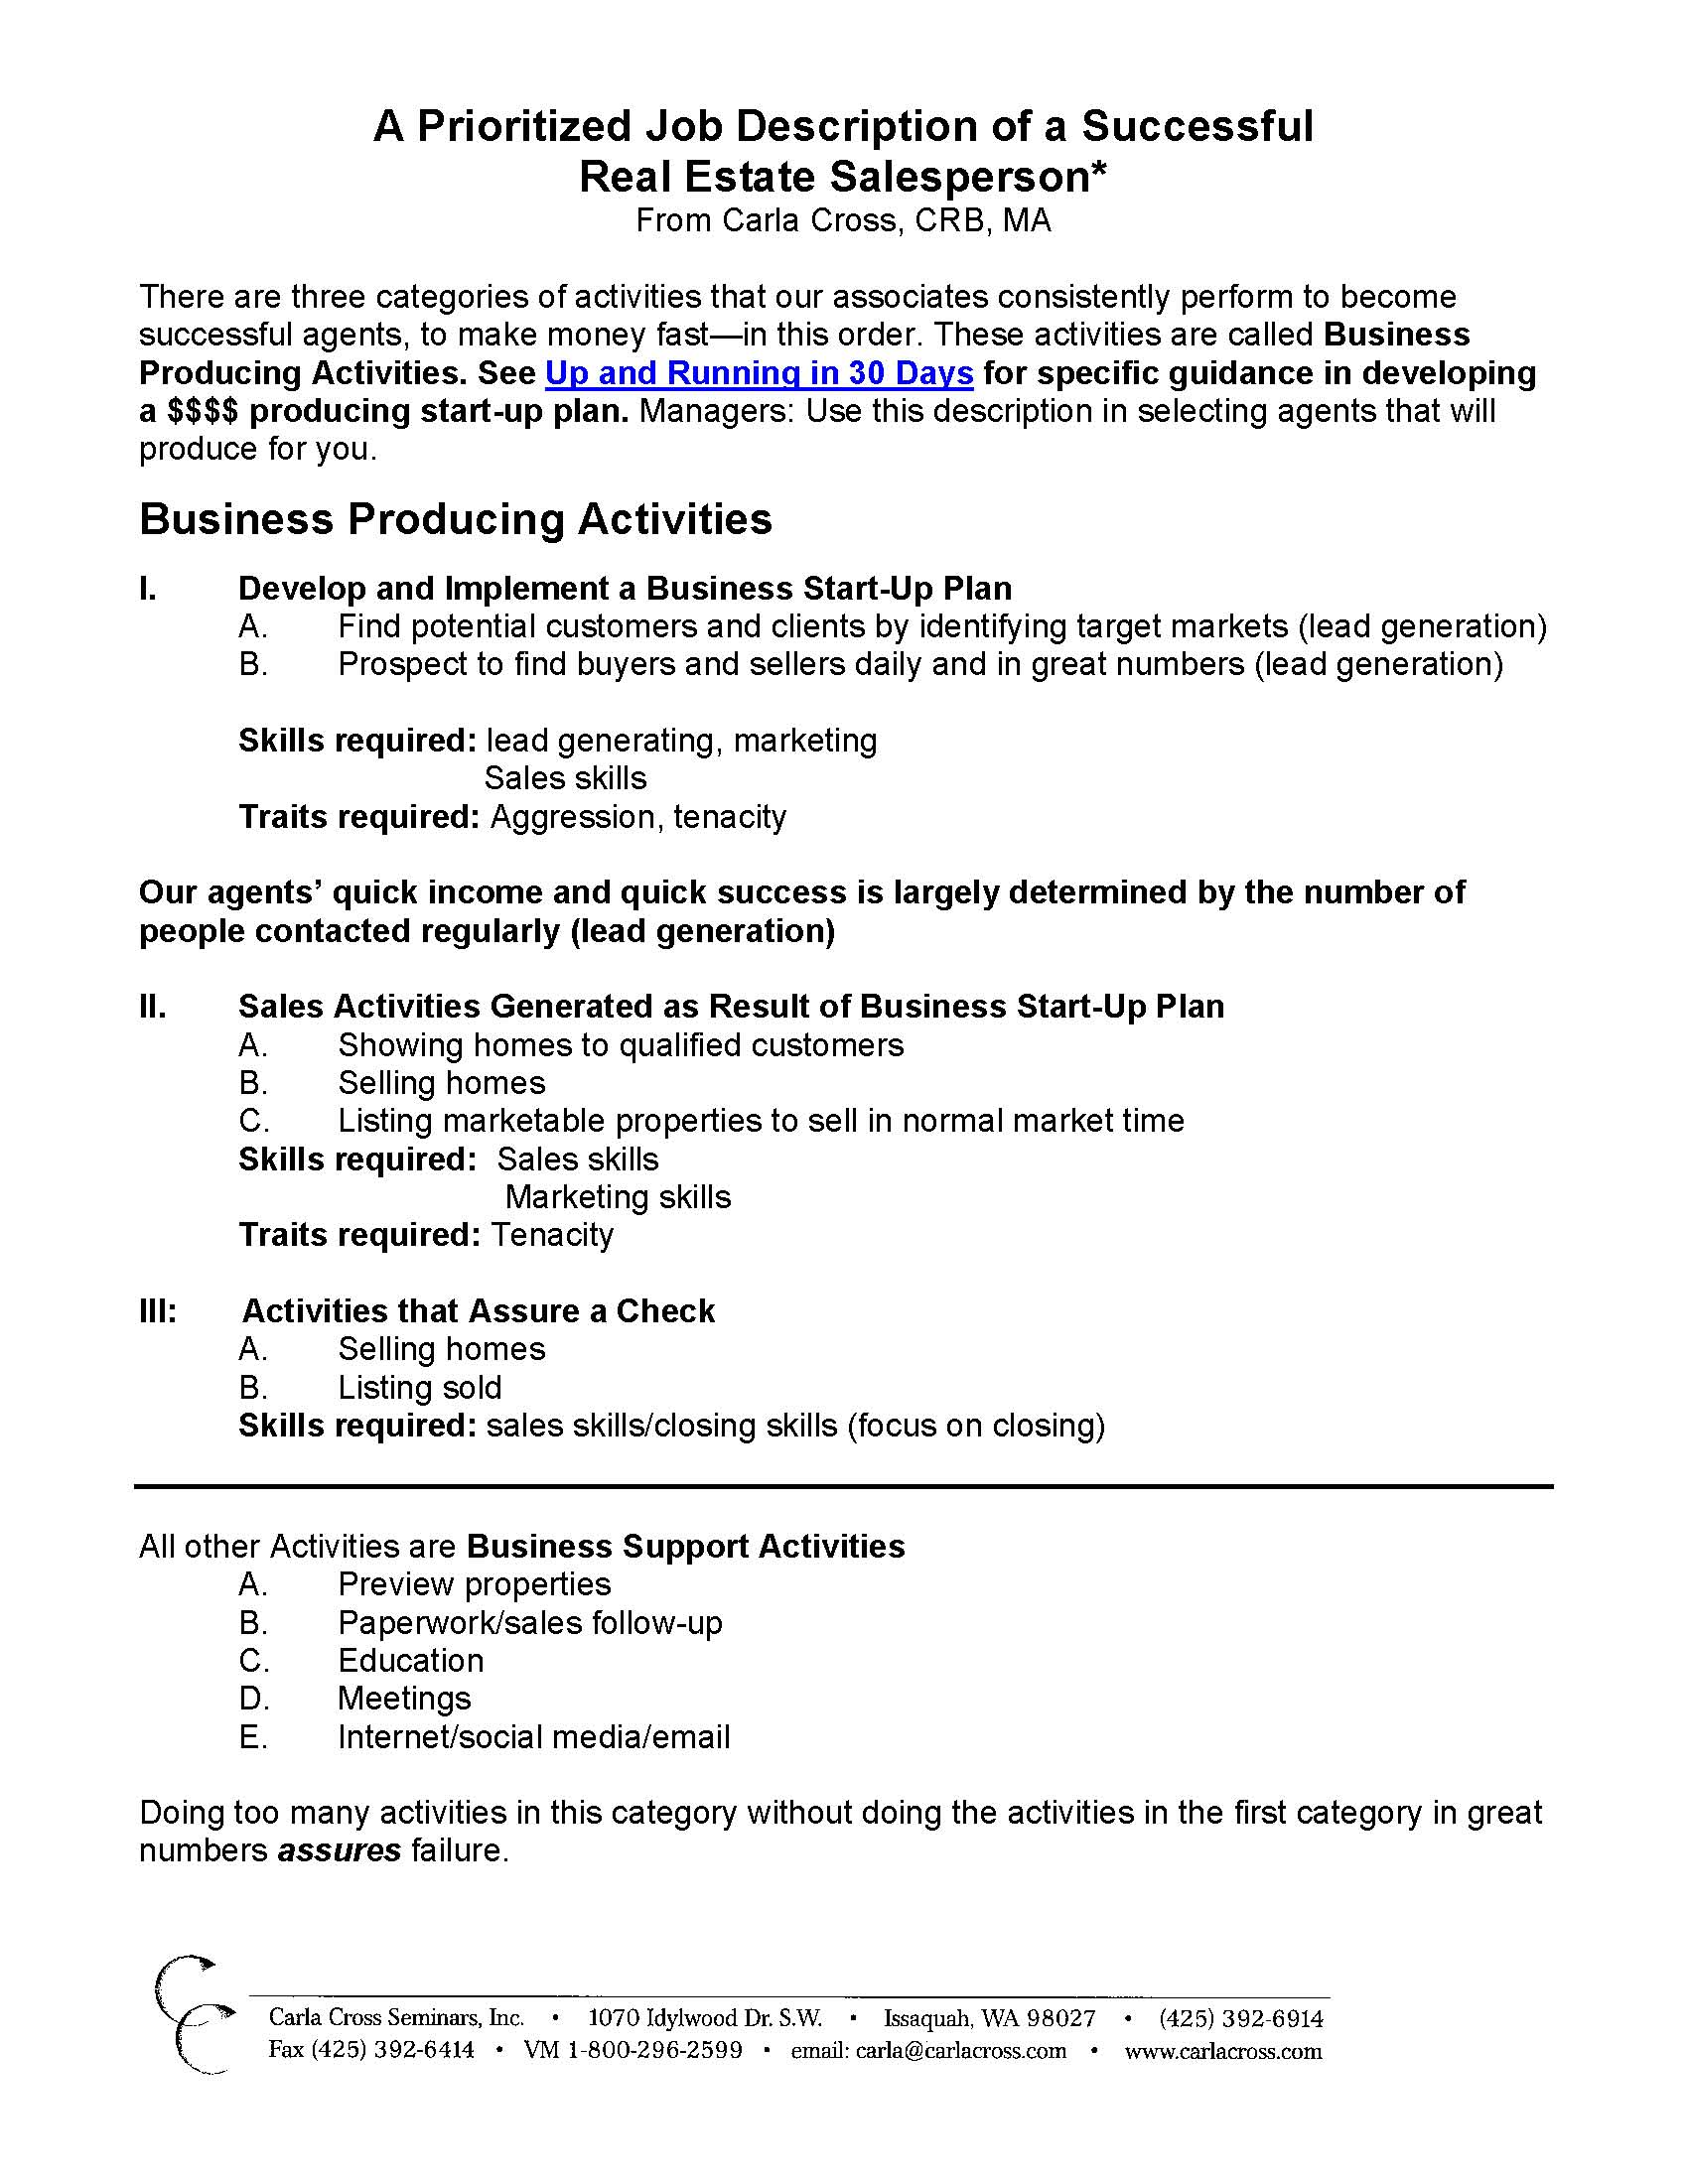 Resume Writing Jobs resume writing job responsibilities resume writing jobs Resume Writing Job Responsibilities Resume Writing Jobs